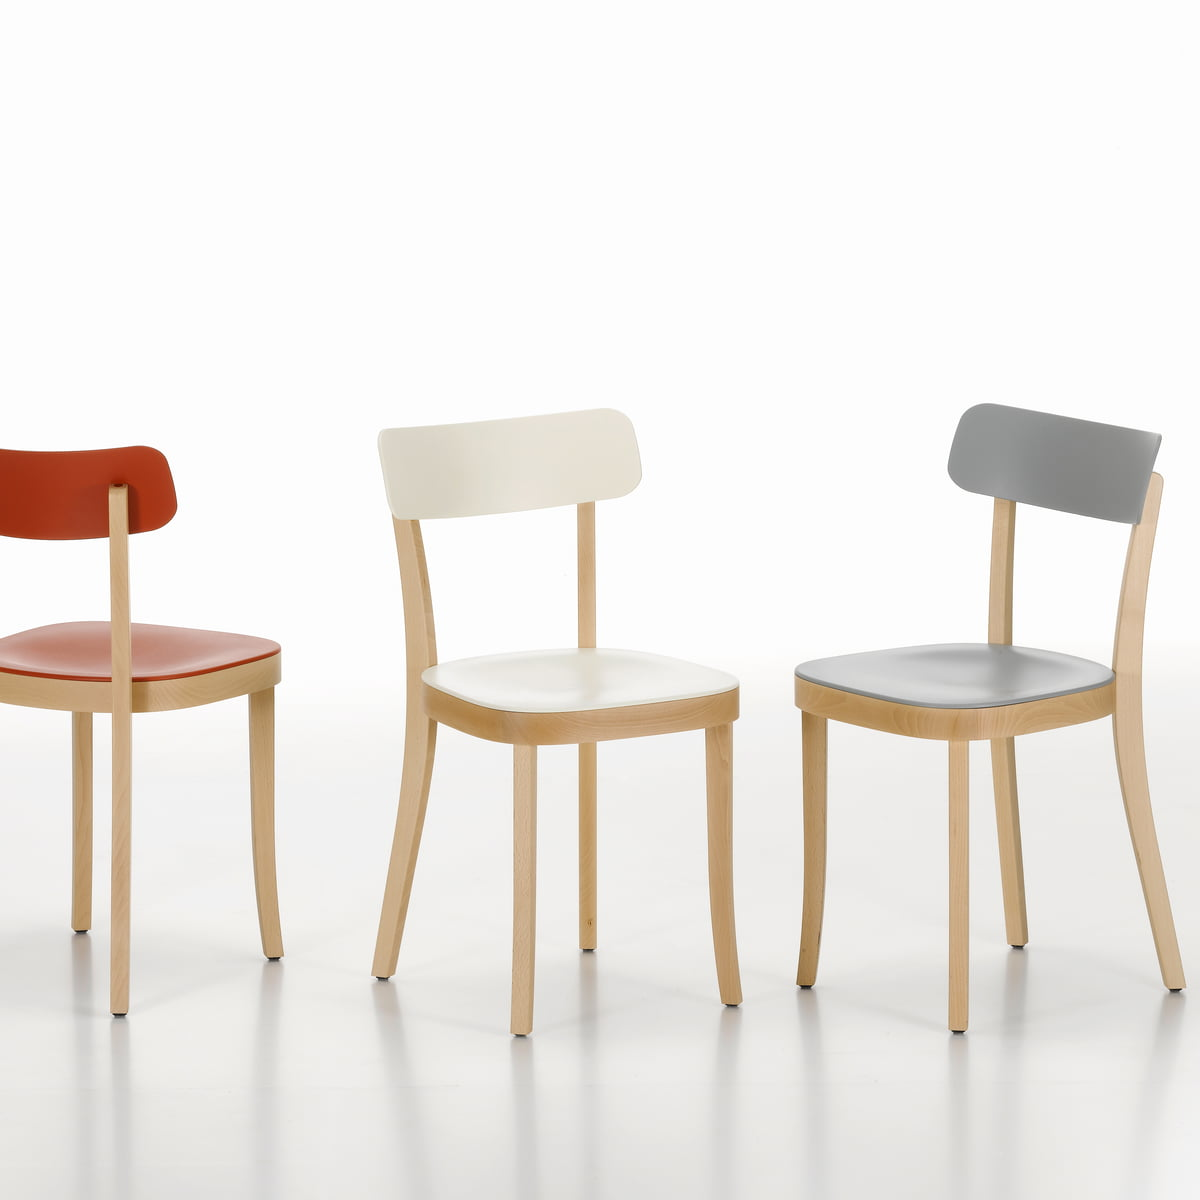 basel chair  vitra  shop - vitra  basel chair